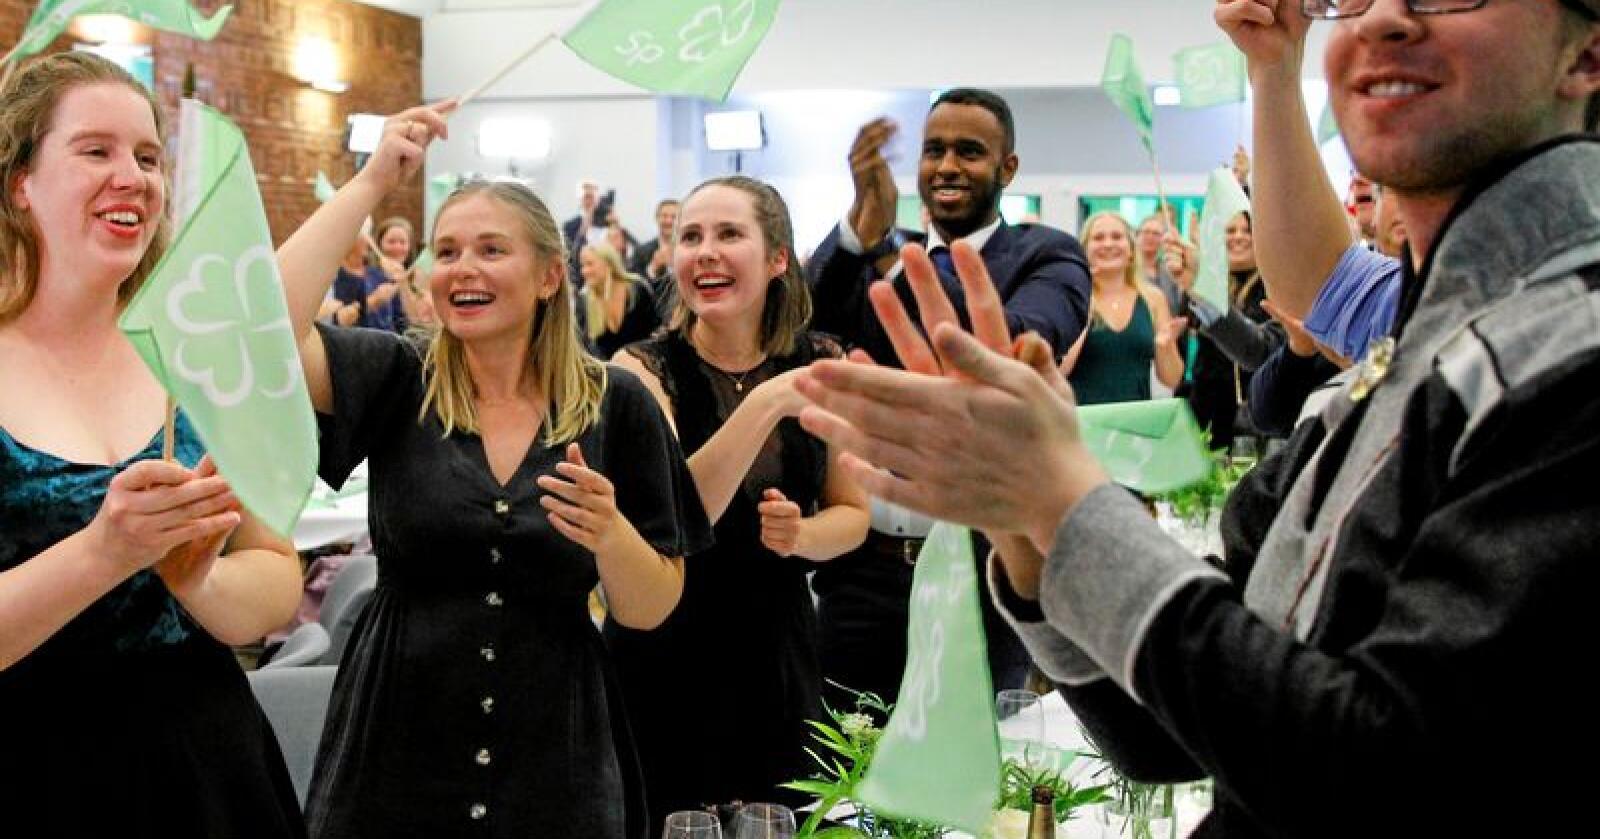 Jubel under valgvaken til Senterpartiet (Sp) på Ingeniørenes hus i Oslo. Foto: Audun Braastad/NTB scanpix